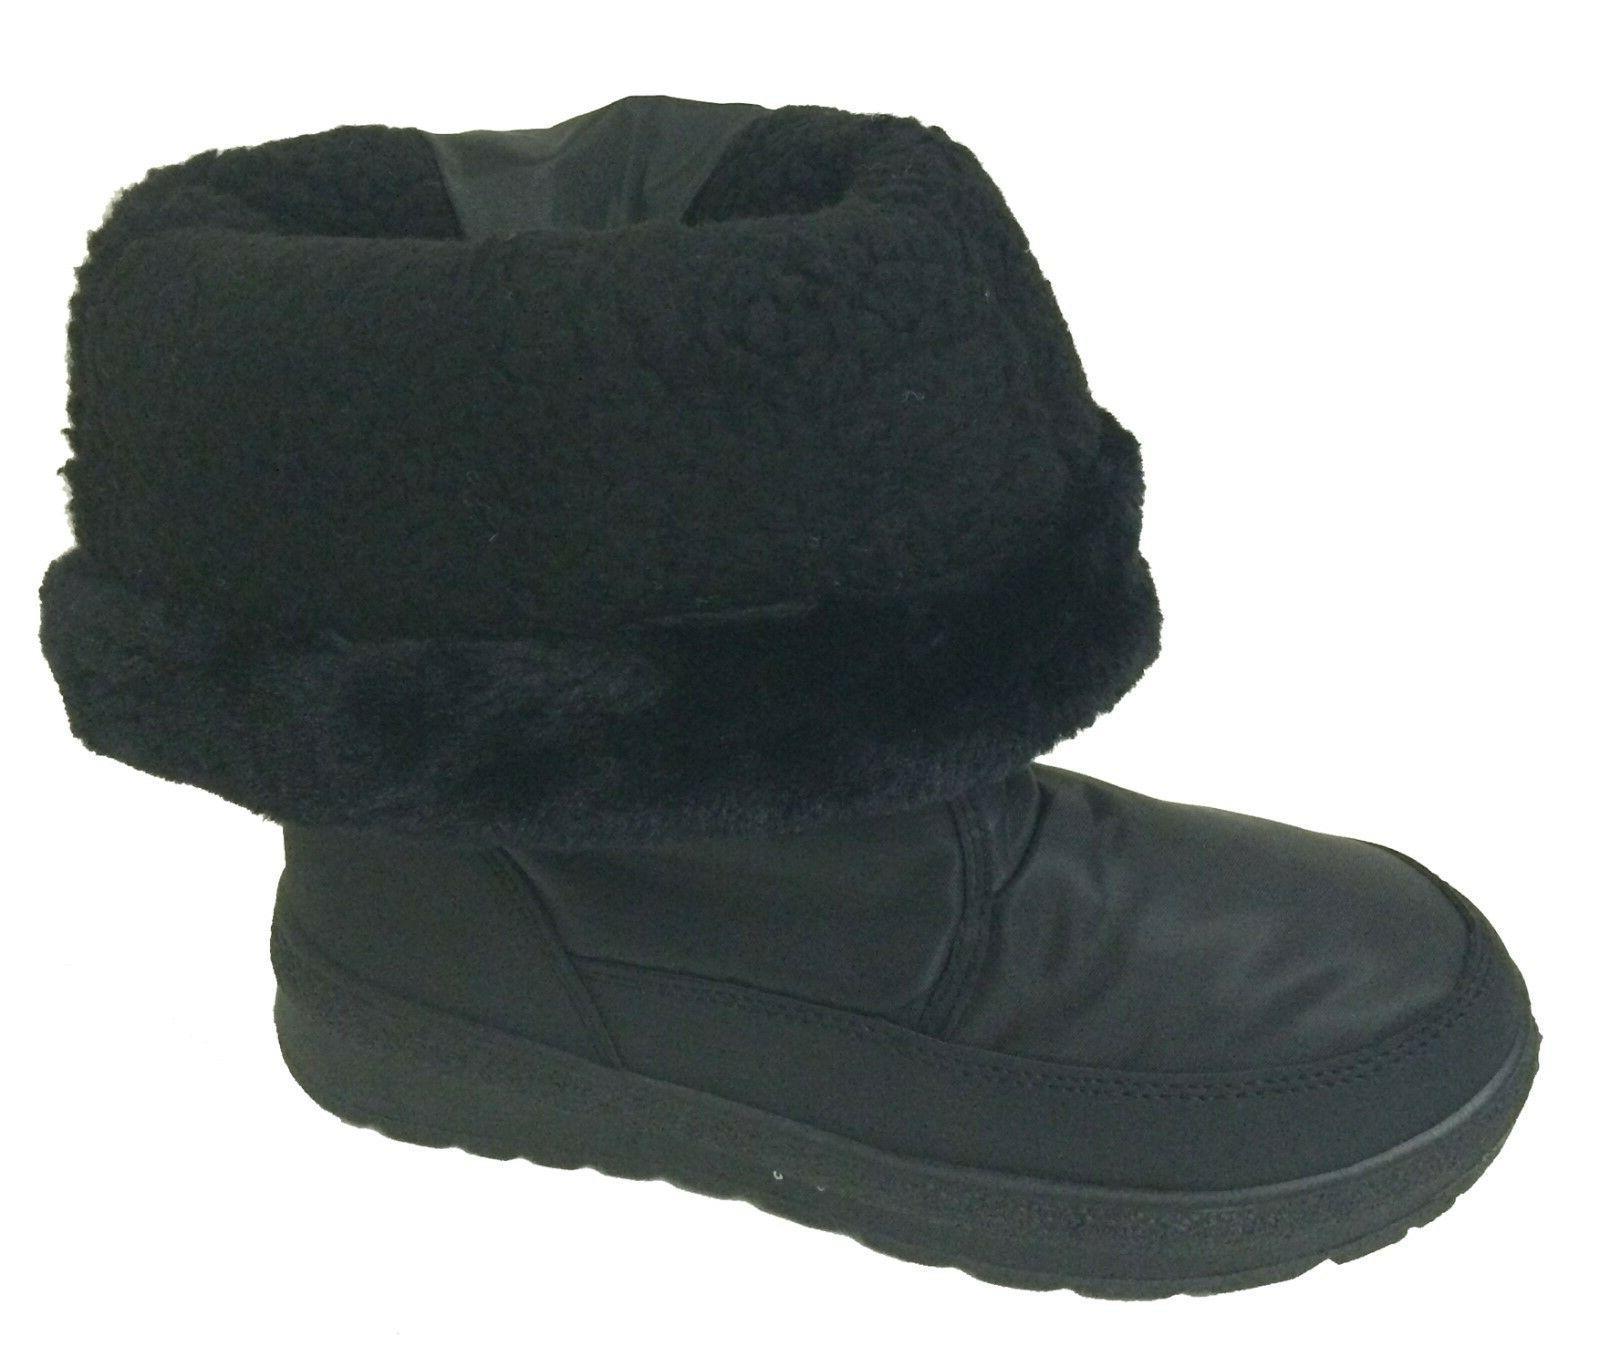 New Women's Boots Fur Lined Zipper Ski Snow Shoes